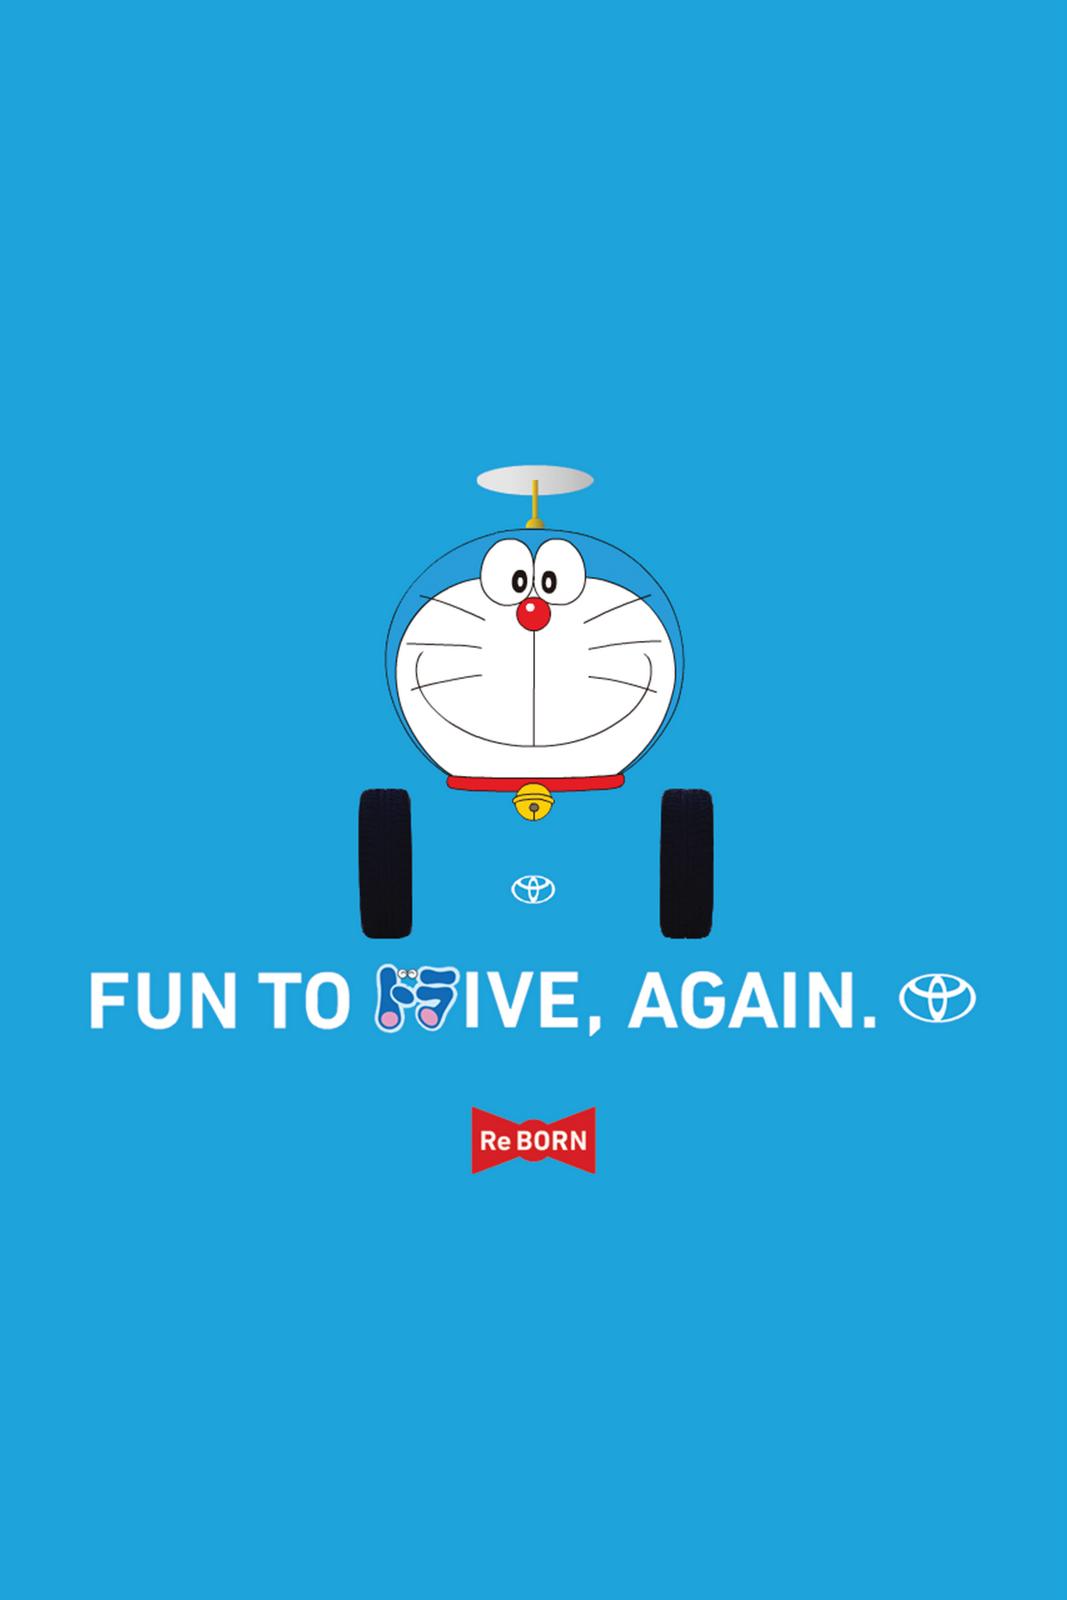 49+] Doraemon Wallpaper for iPhone on WallpaperSafari